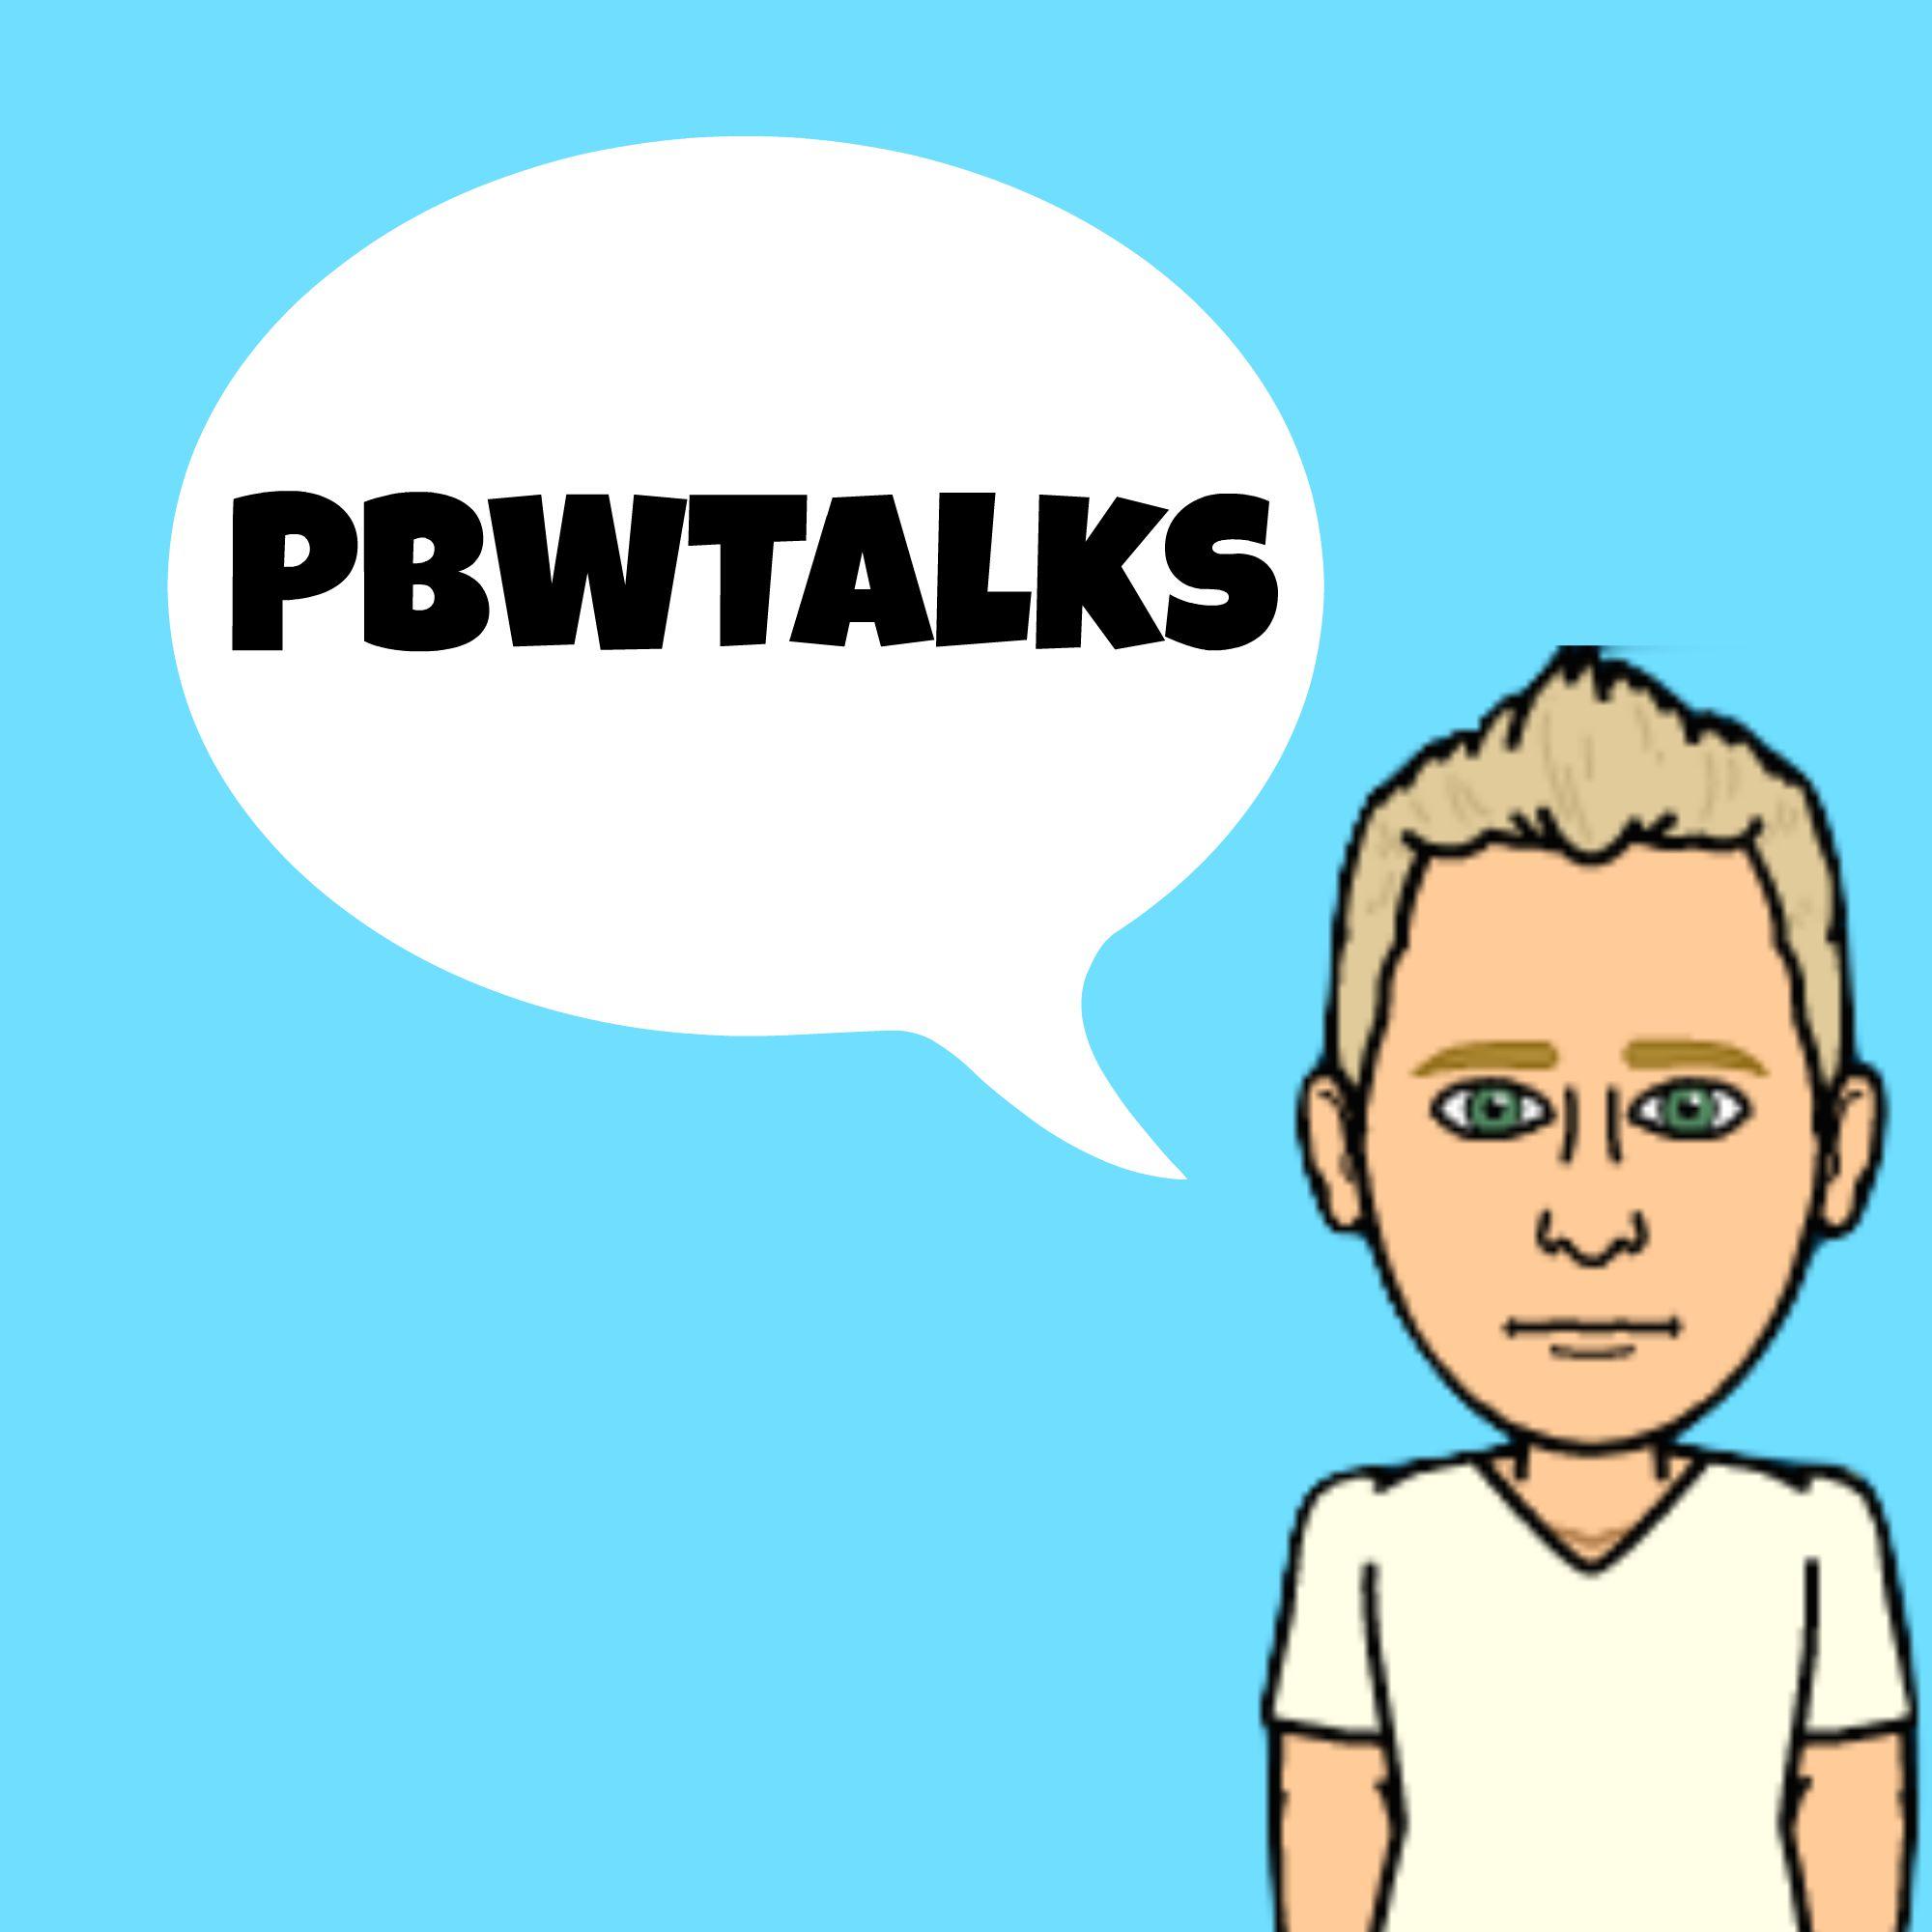 PBWTalks